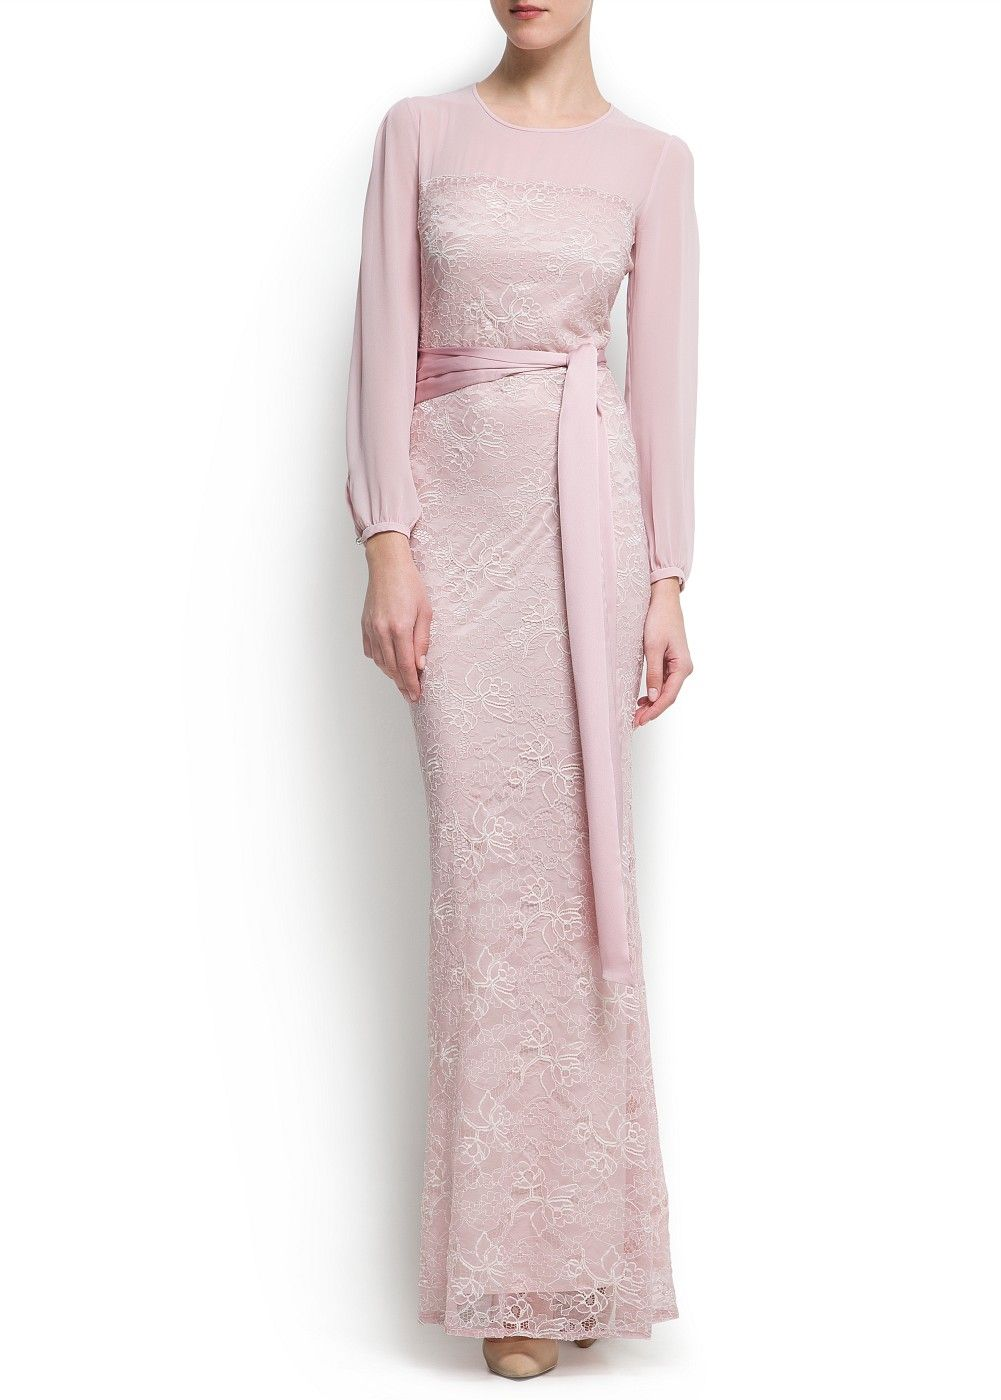 Alia bastamam wedding dress  Lace gown  Women  kby inspirasi   Pinterest  Dresses Gowns and